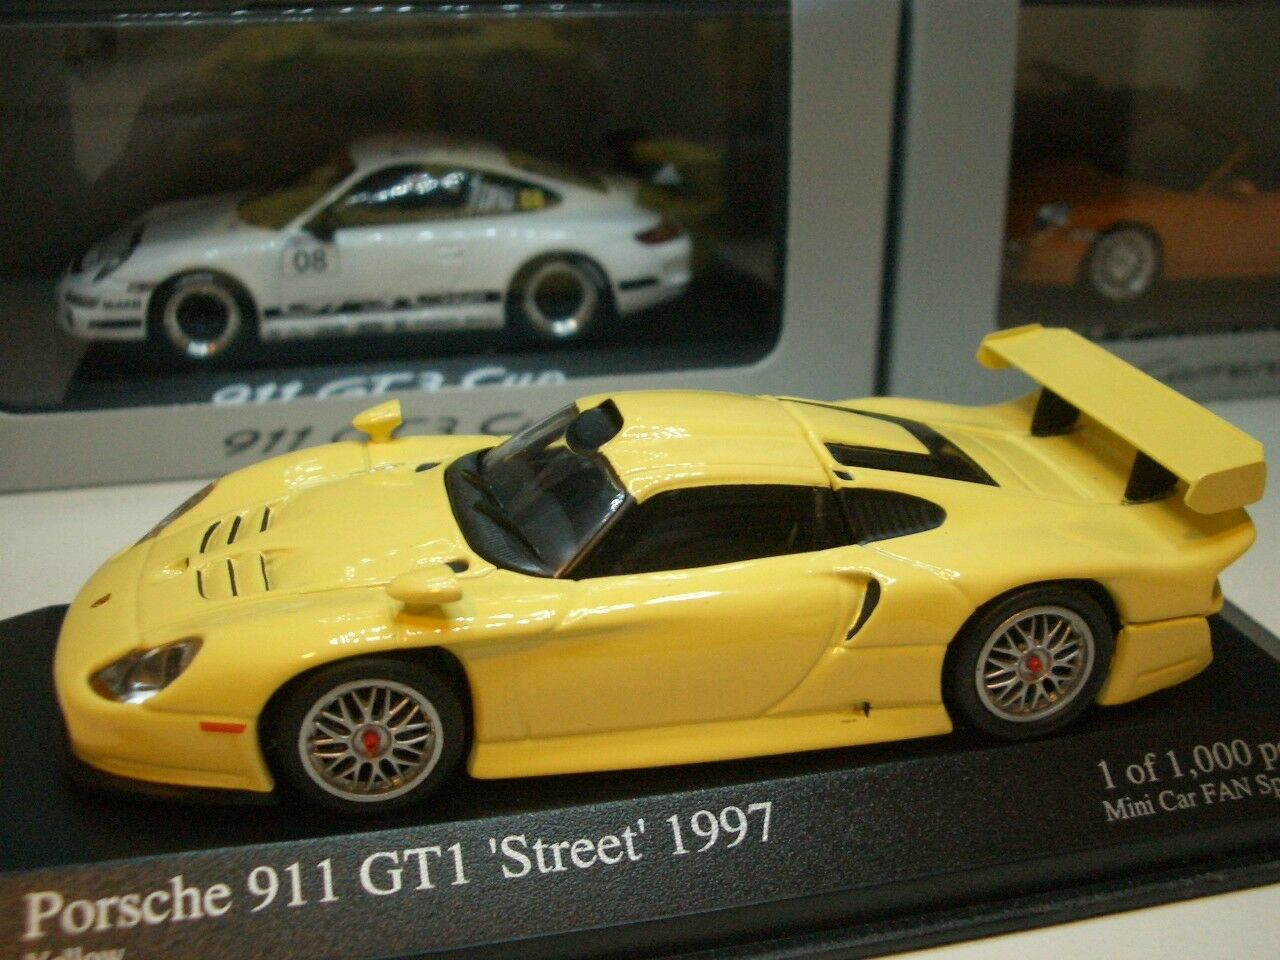 1/43 Minichamps Porsche 911 GT1 (Mini Car FAN Special) diecast